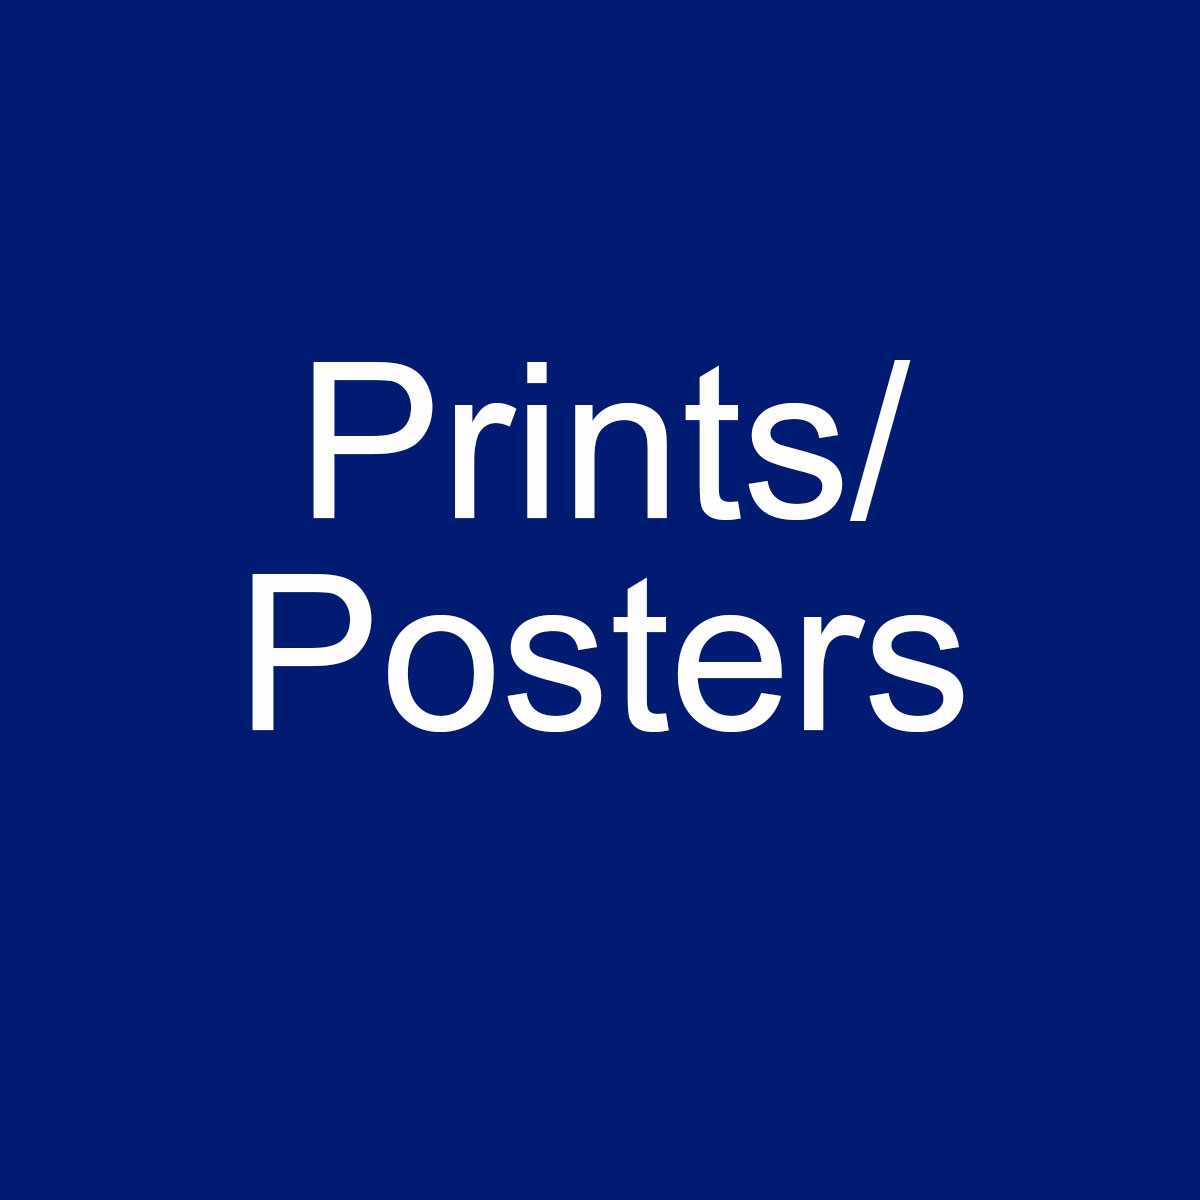 Prints / Posters